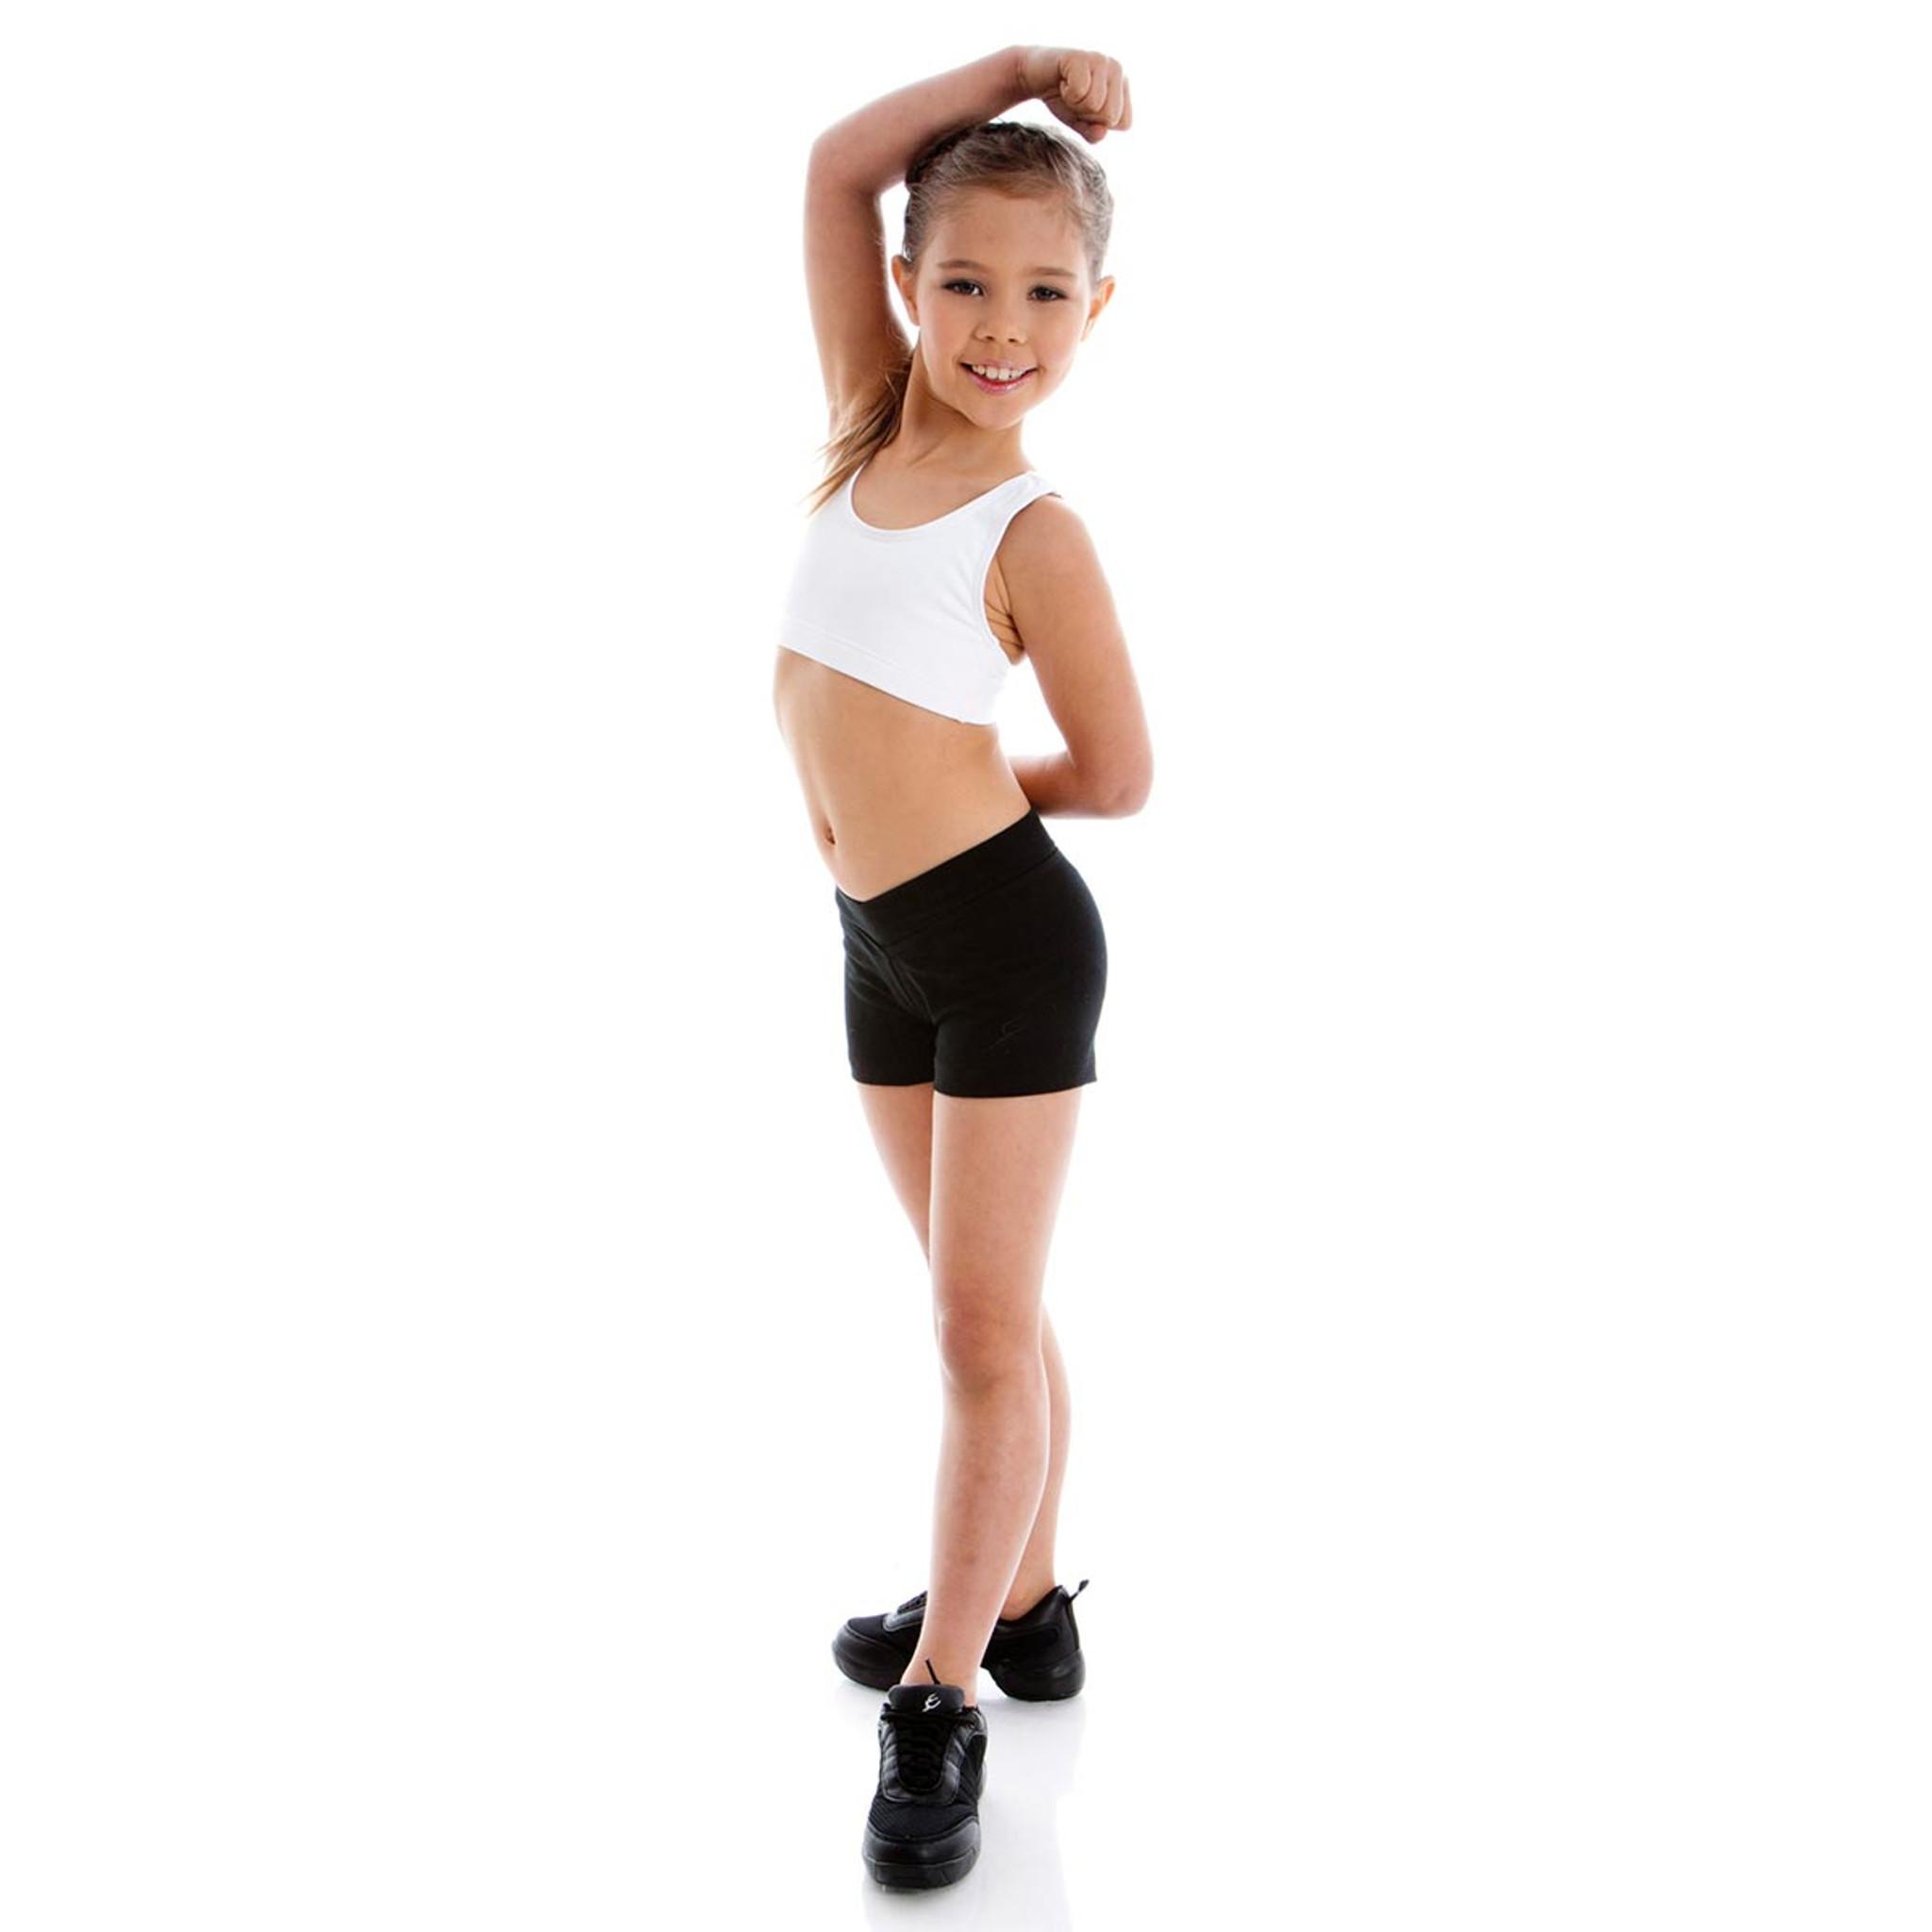 698b0e260 Energetiks V Band Short - Girls Dance Shorts - DANCE DIRECT®